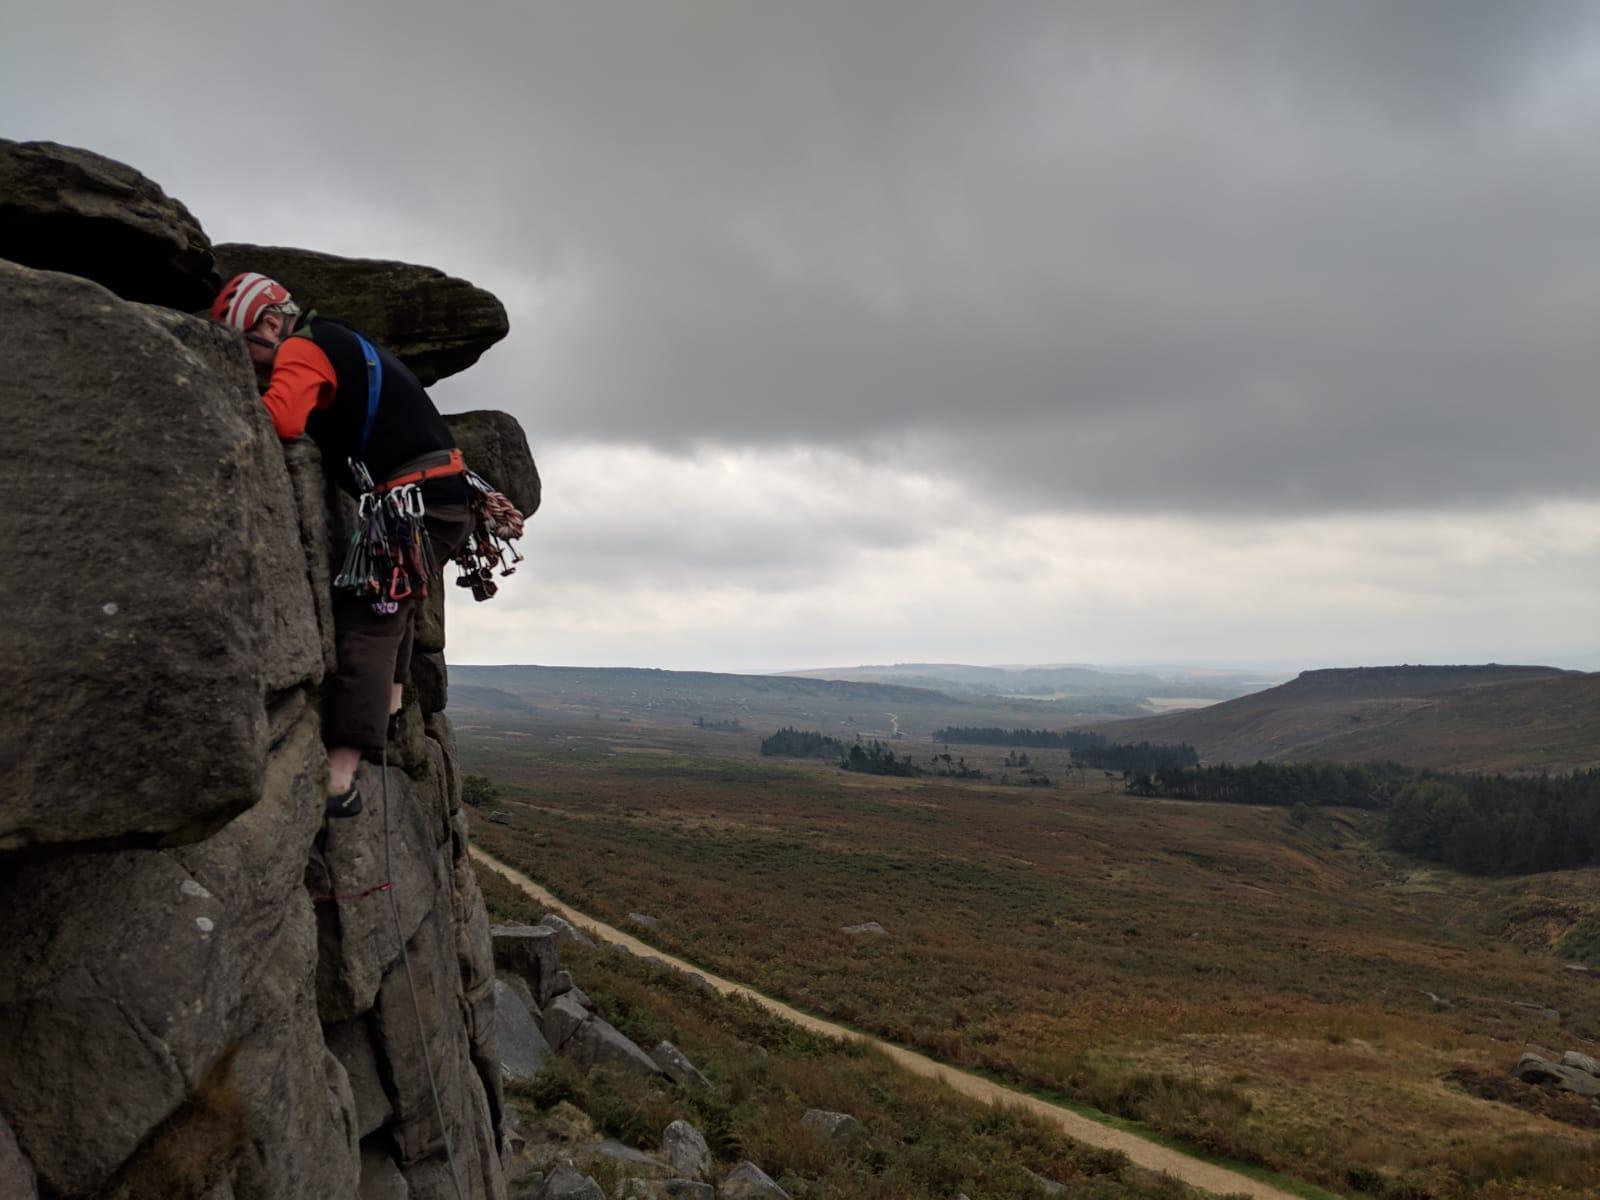 Climbing instructor